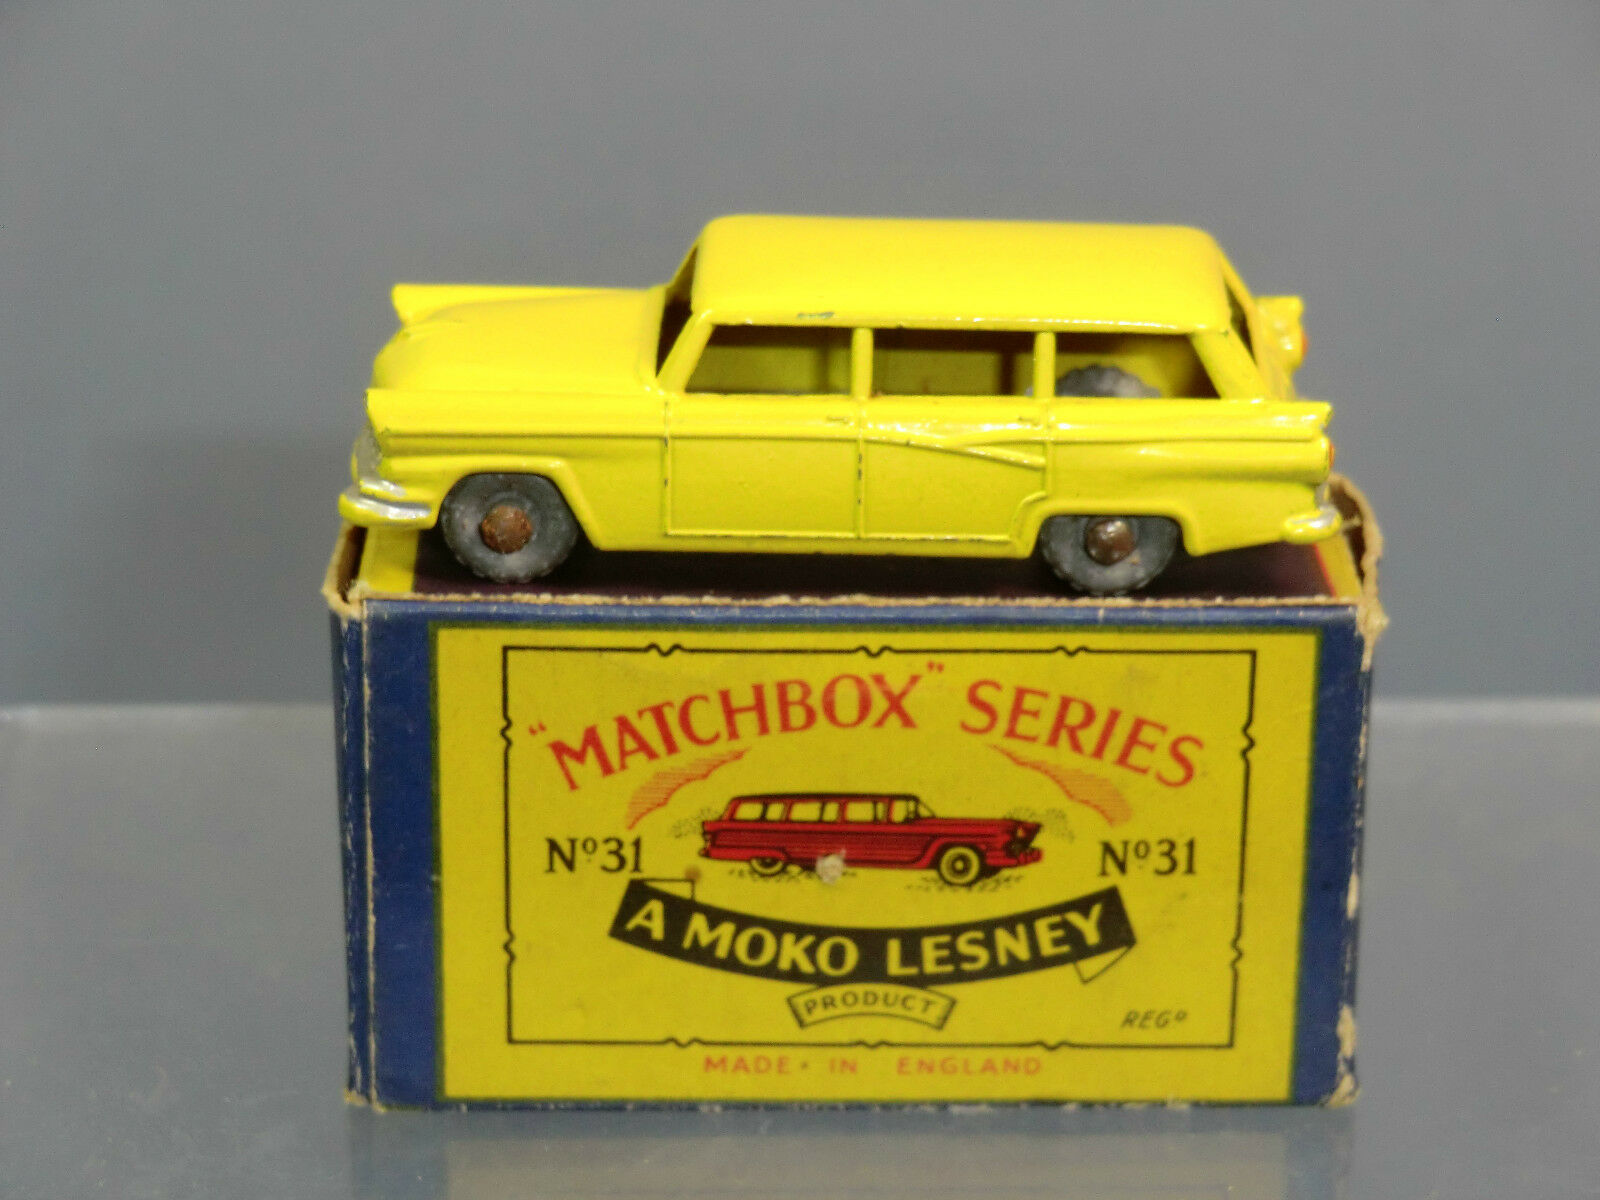 MATCHBOX MOKO LESNEY MODEL No.31a FORD   STATION WAGON       VN  MIB